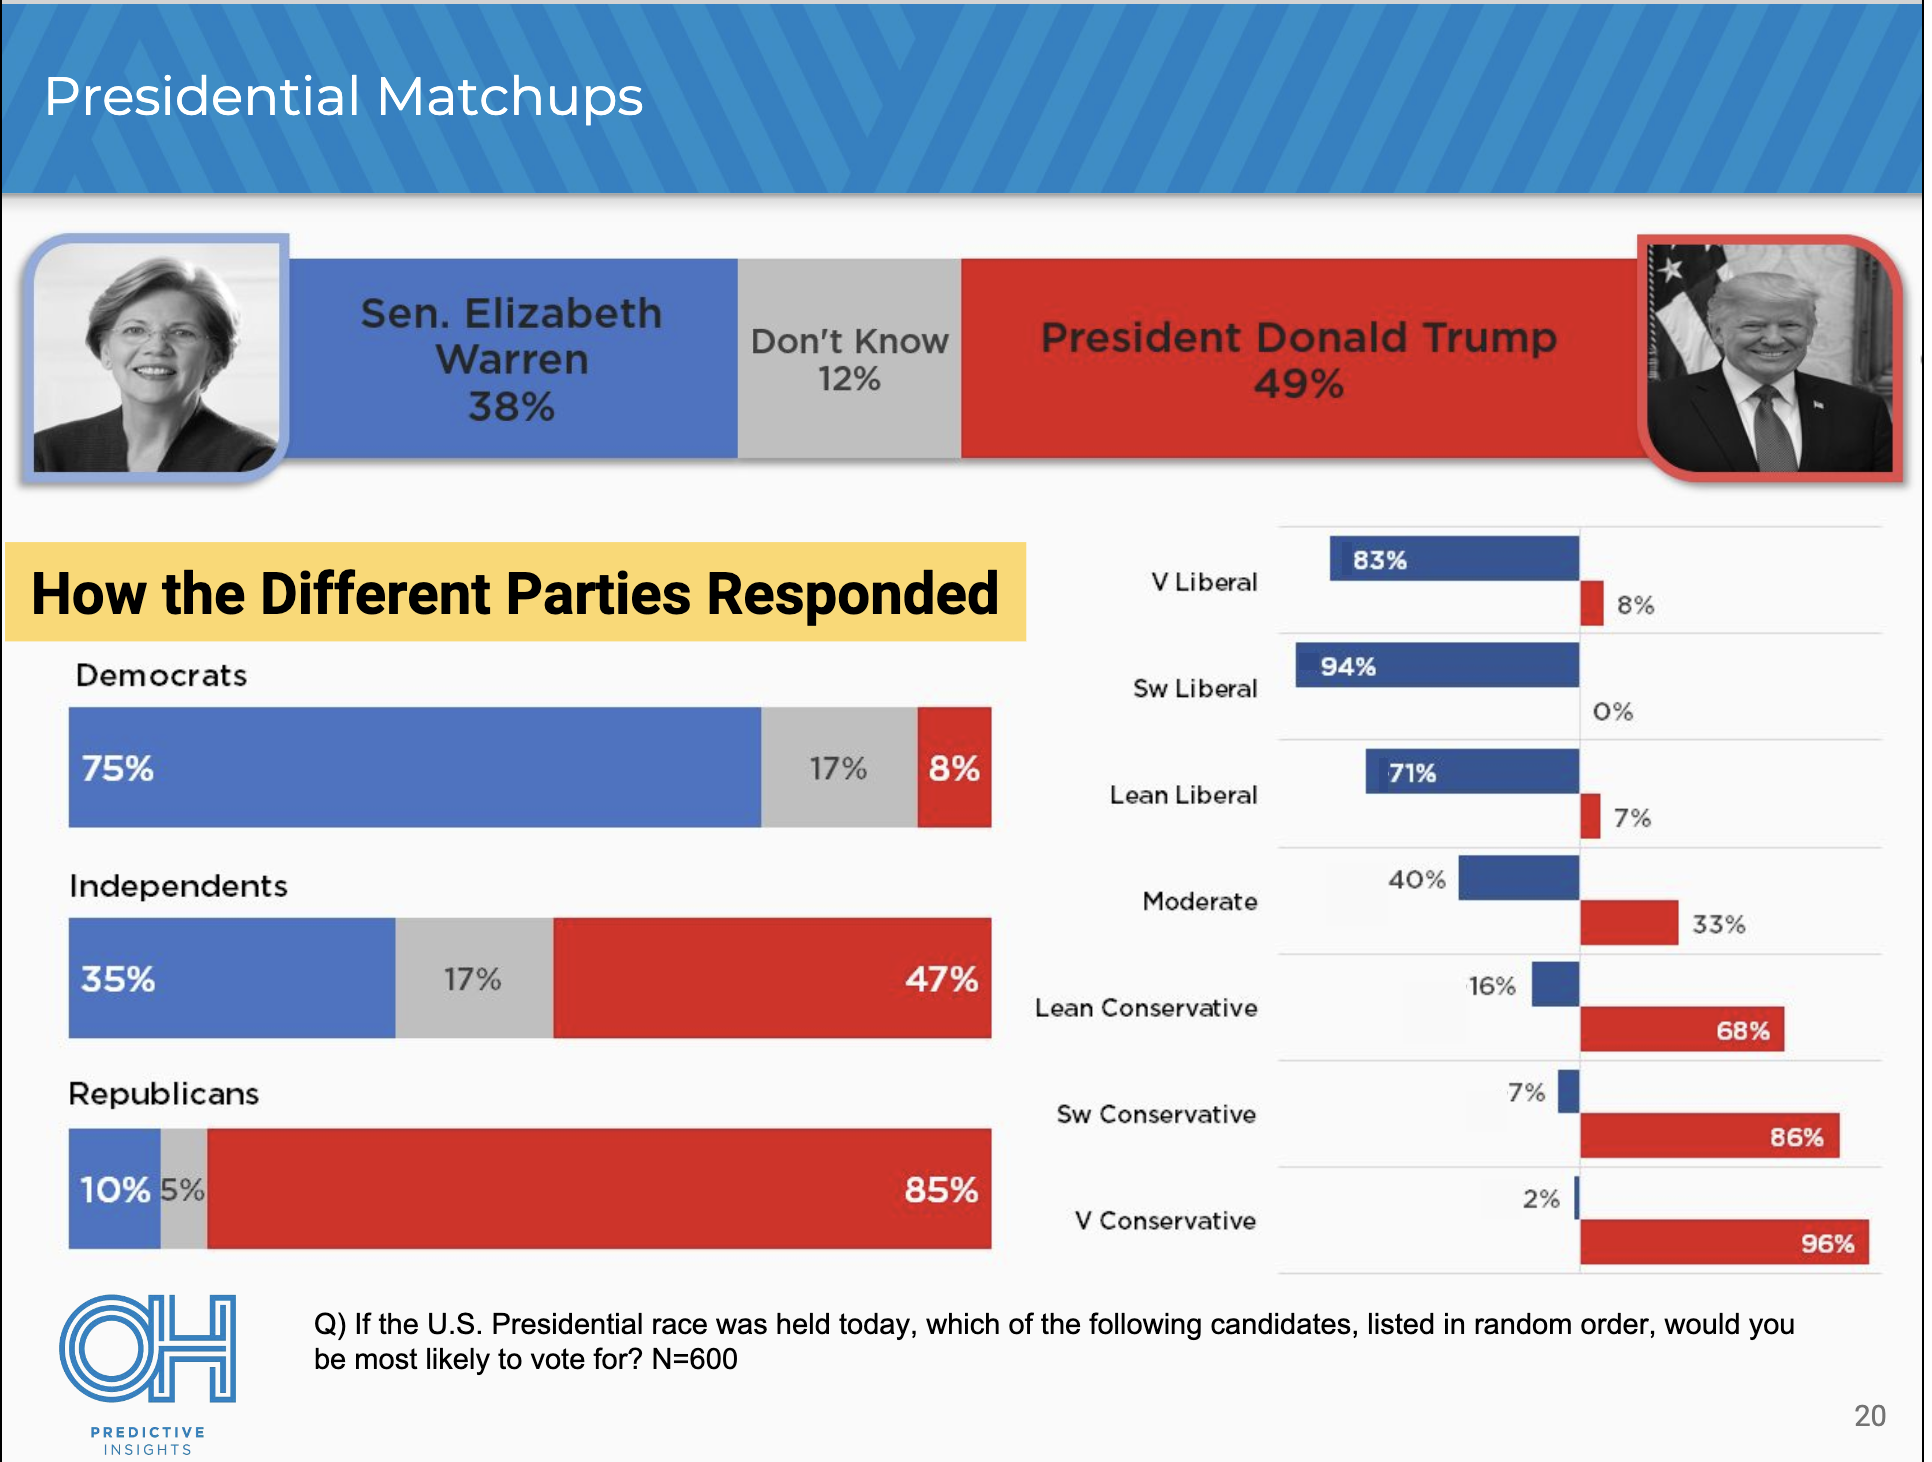 Screen-Shot-2019-05-07-at-8.45.41-AM New 2020 Poll Sends Left & Right Into A Tizzy - Social Media Explodes Donald Trump Election 2020 Politics Top Stories